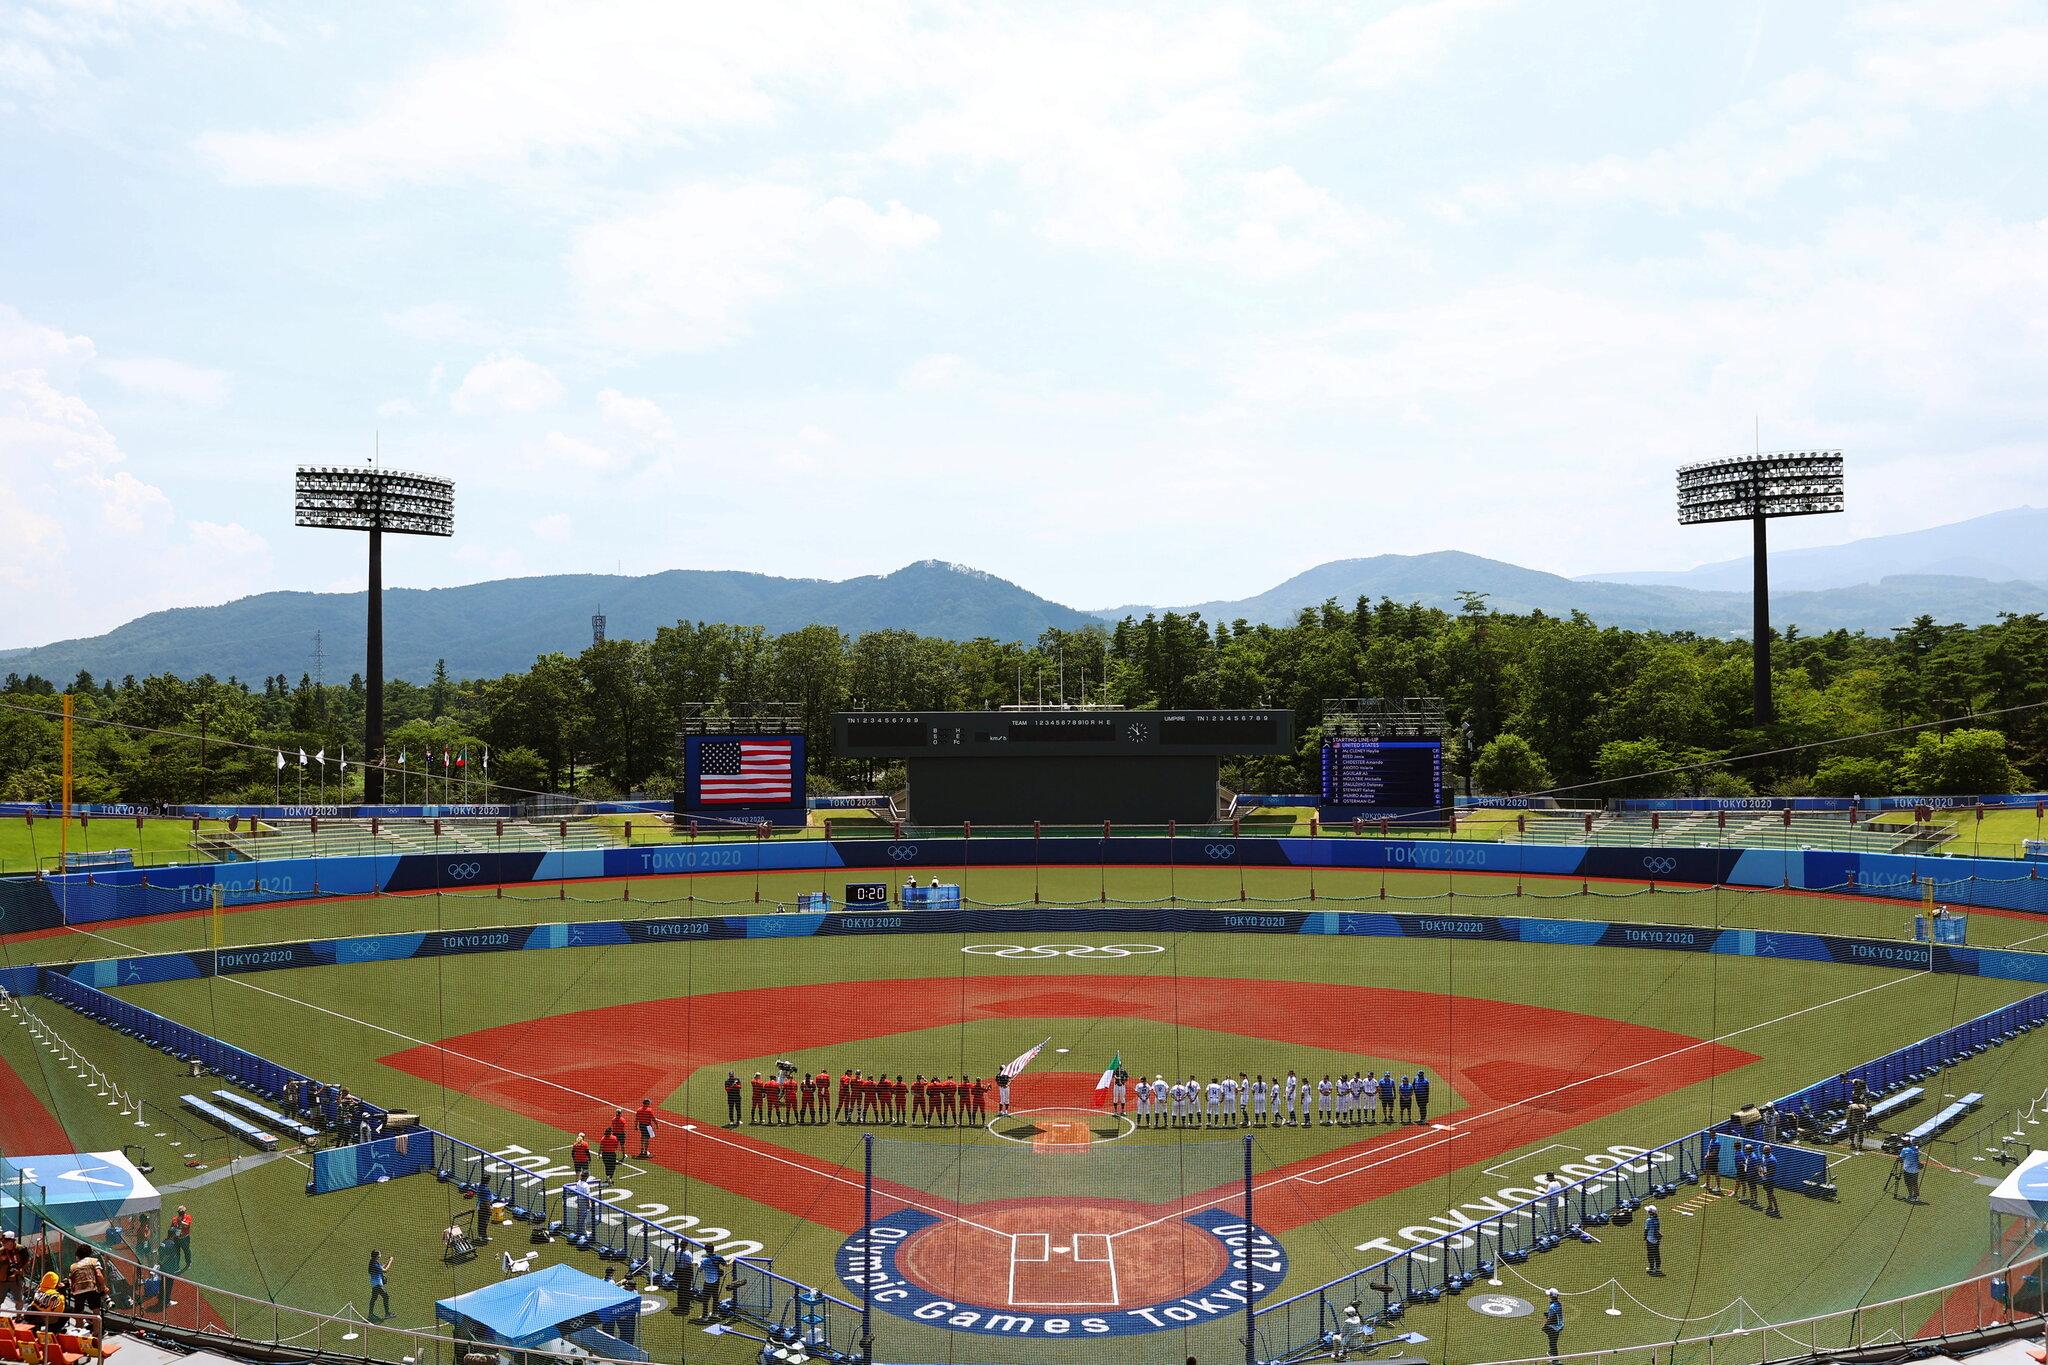 Softball fans express frustration as GOLD MEDAL Game on men's baseball field